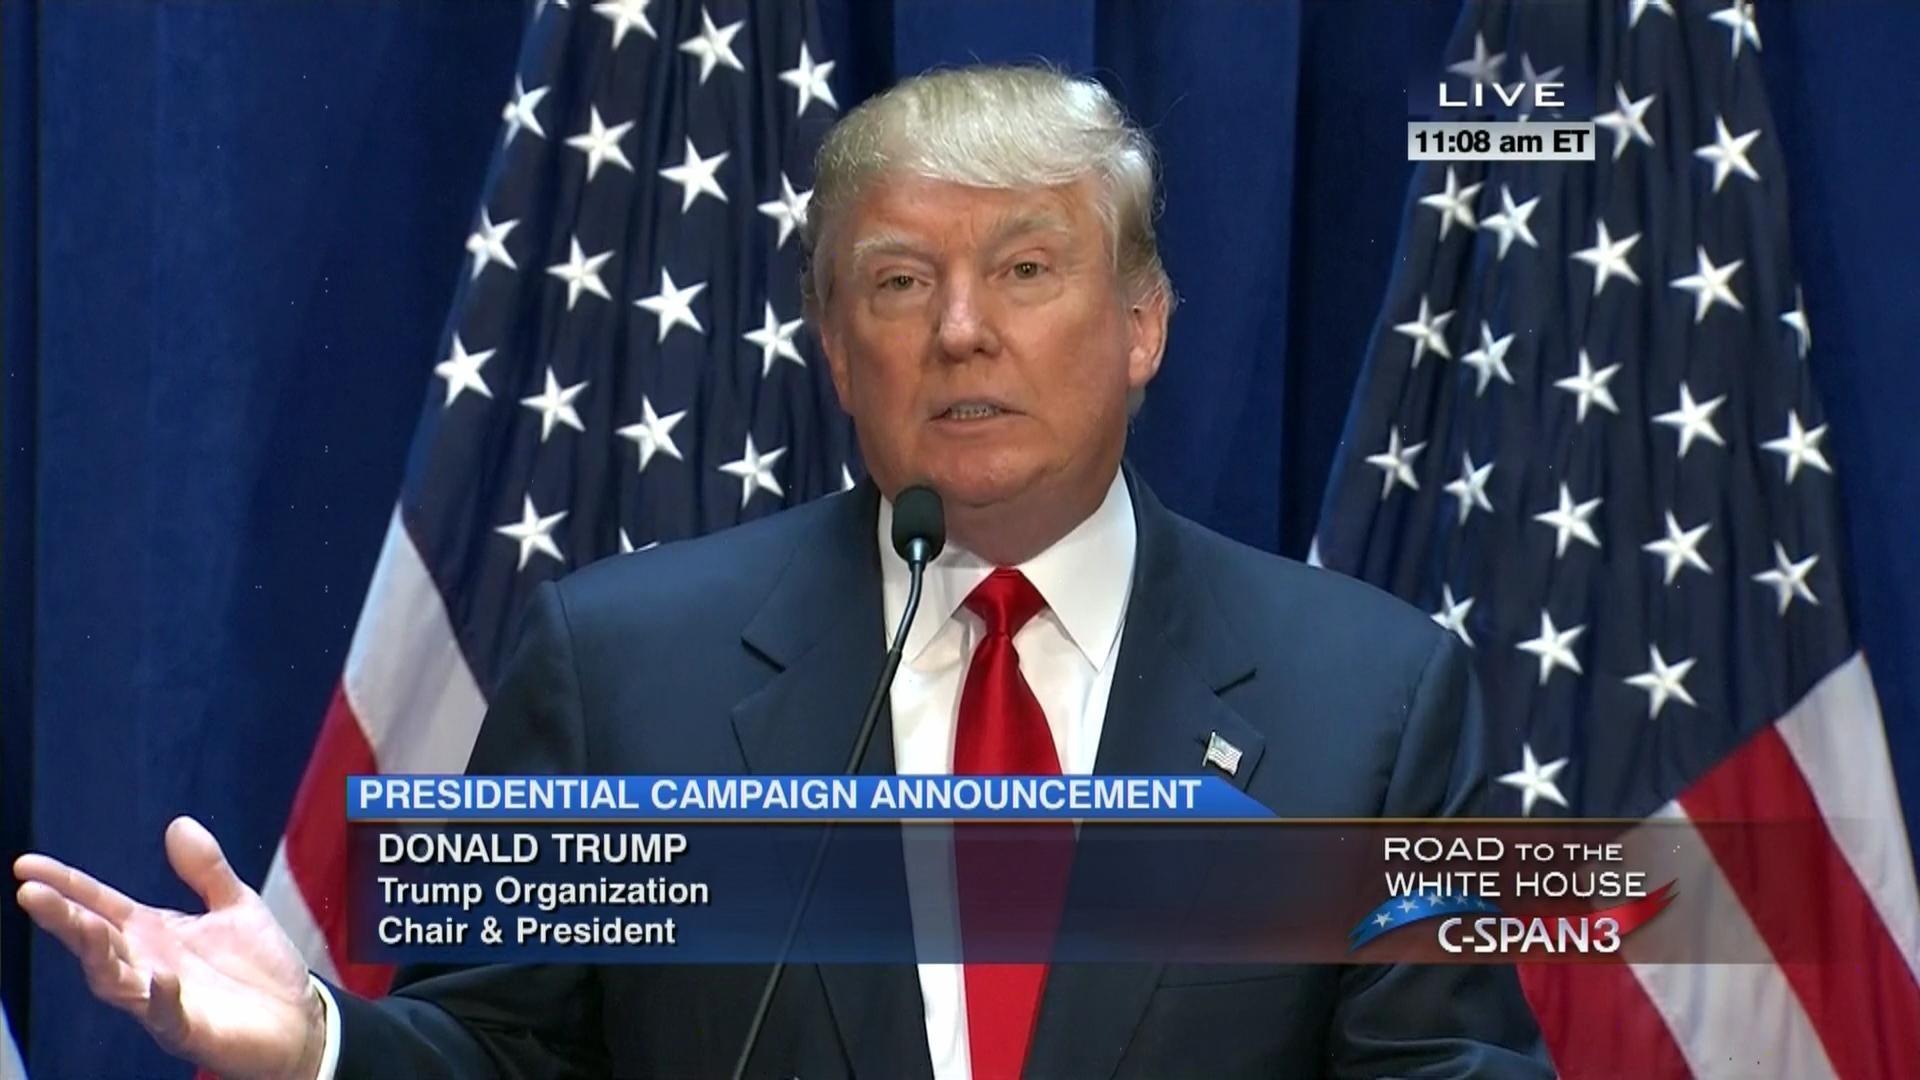 Donald Trump Presidential Campaign Announcement, Jun 16 2015 | C-SPAN.org